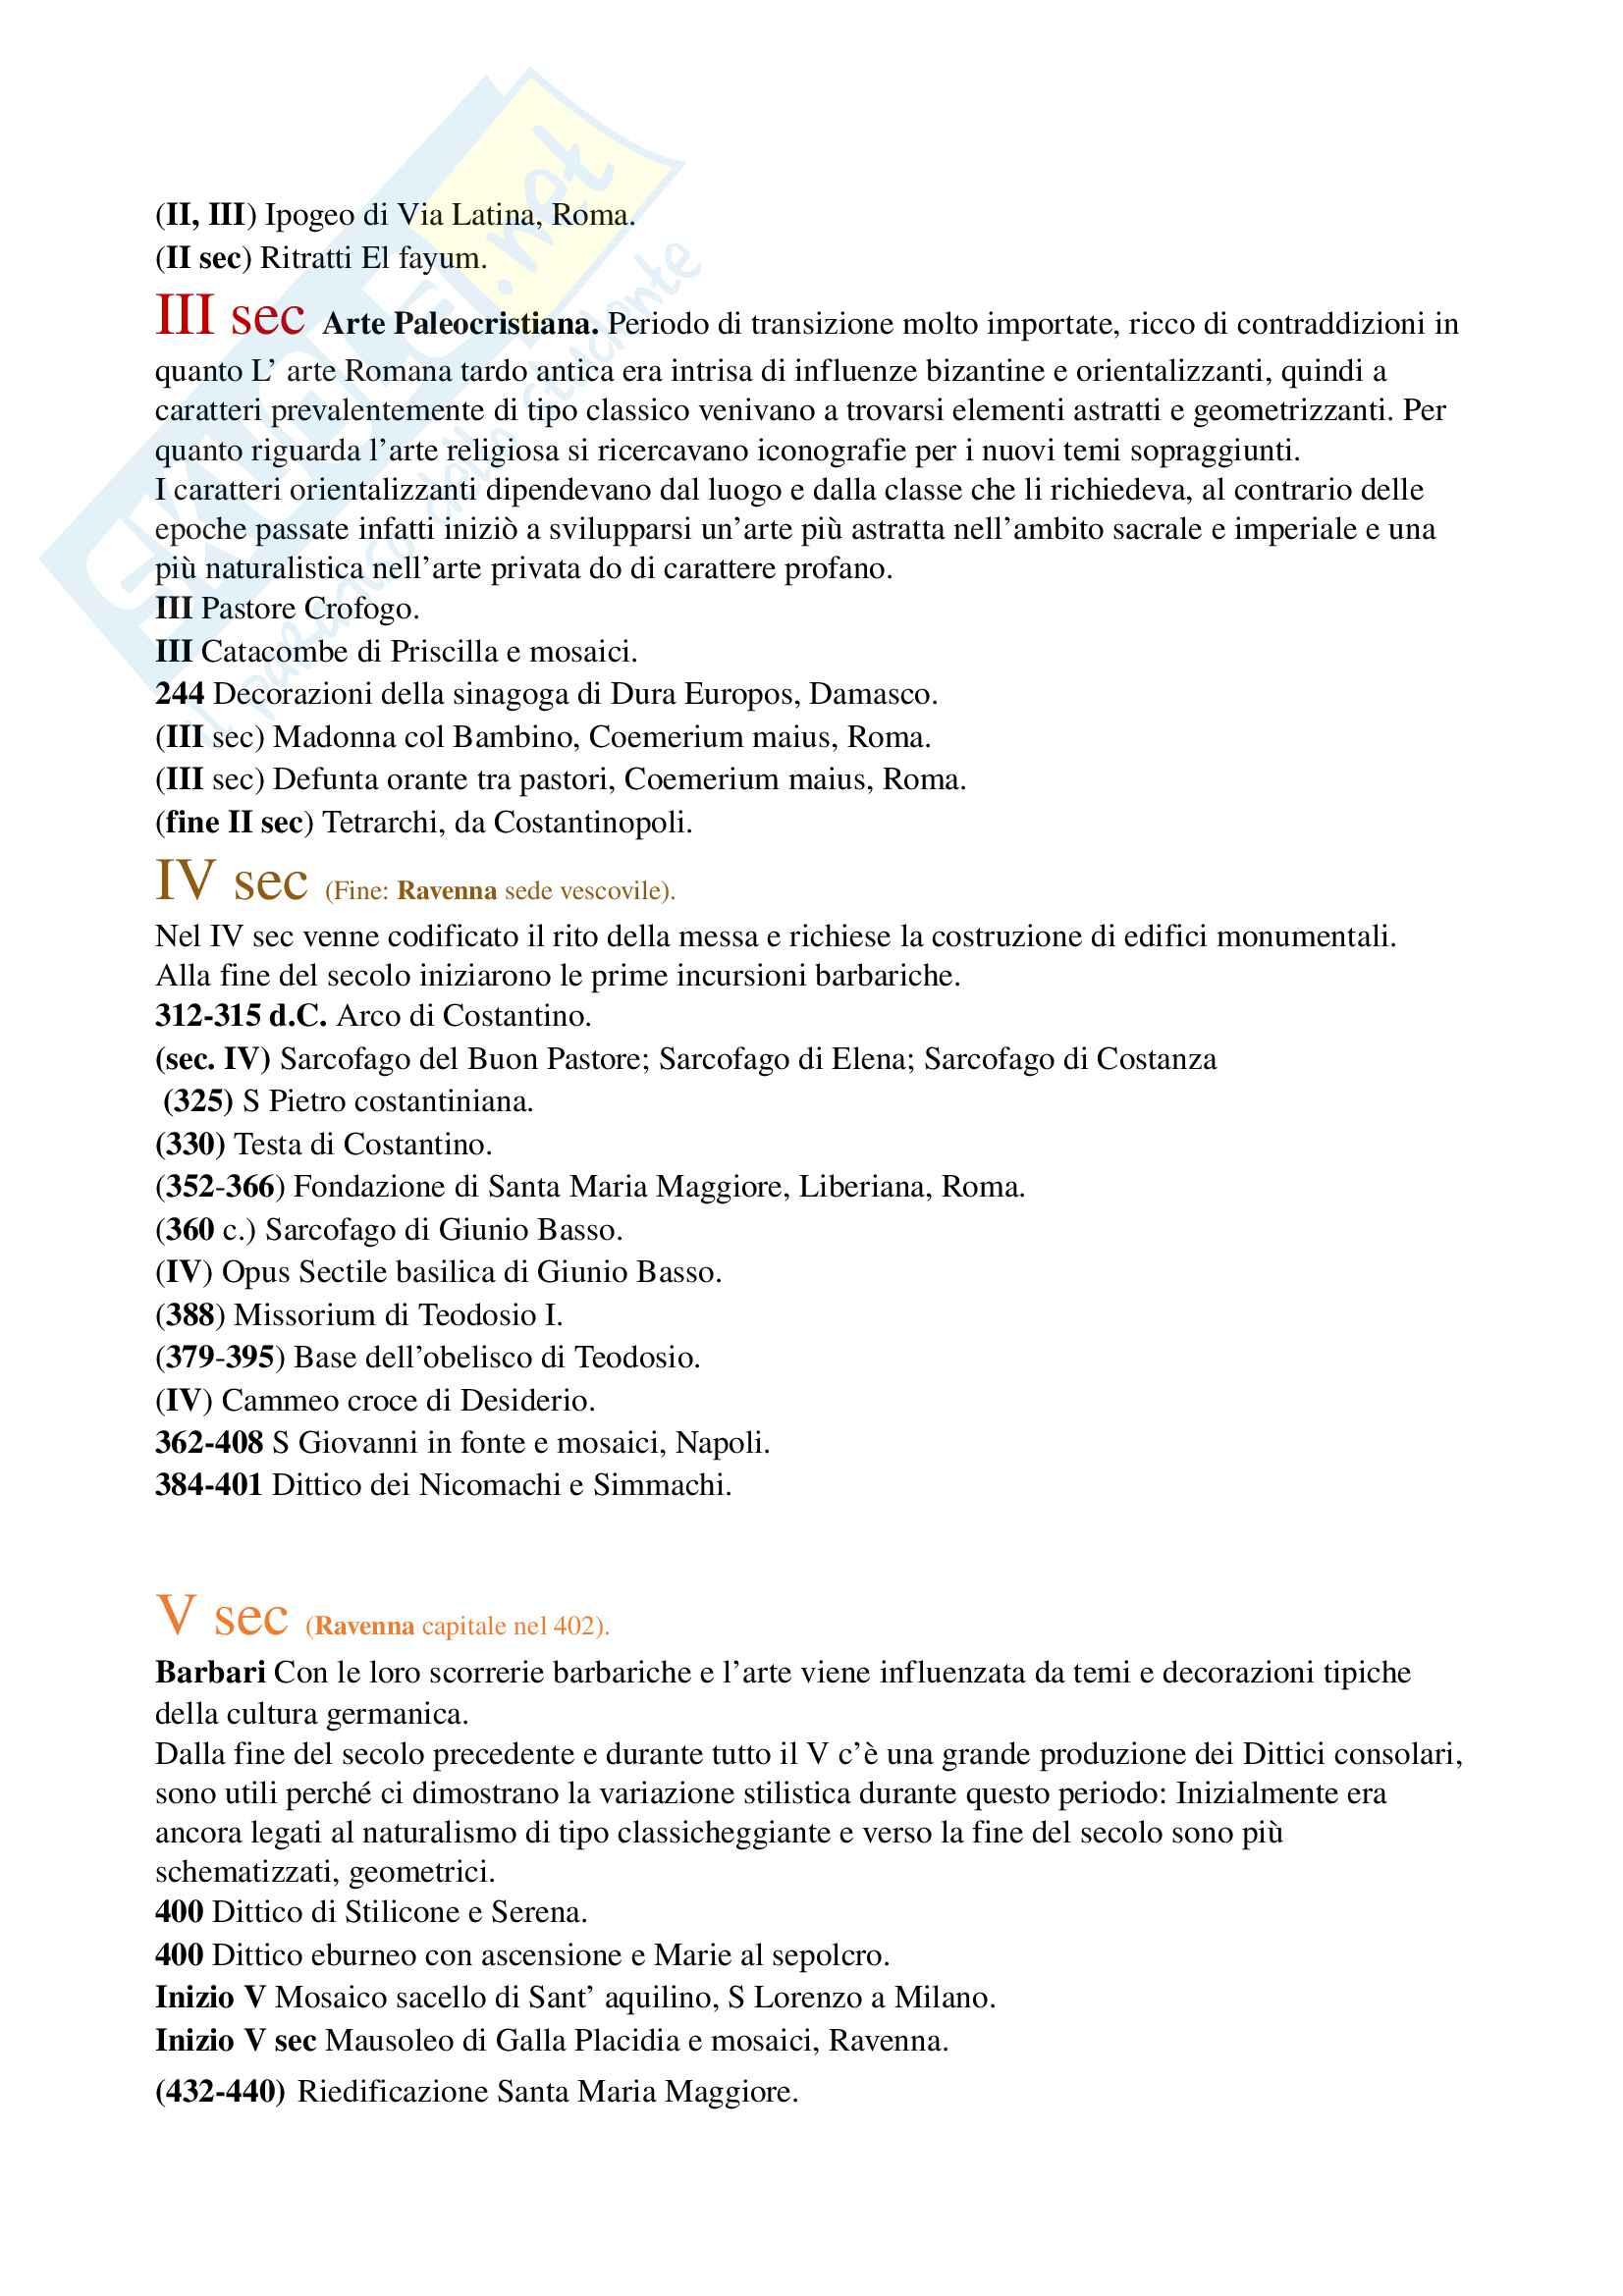 Sintesi cronologica esame di storia dell' arte medievale. Prof. Andrea De Marchi